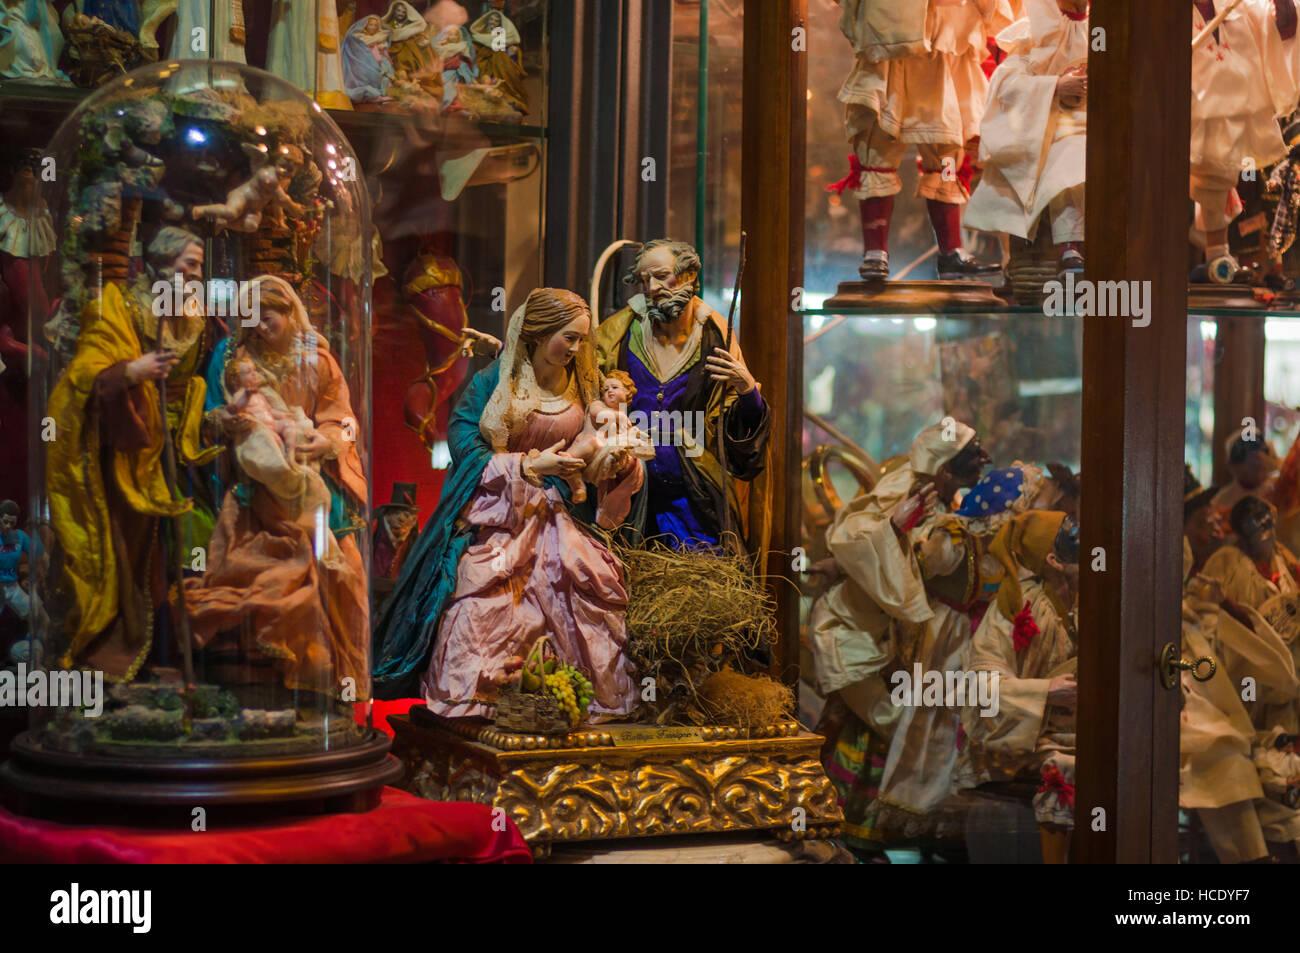 Naples, San Gregorio Armeno, hand made nativity scene for sale - Stock Image